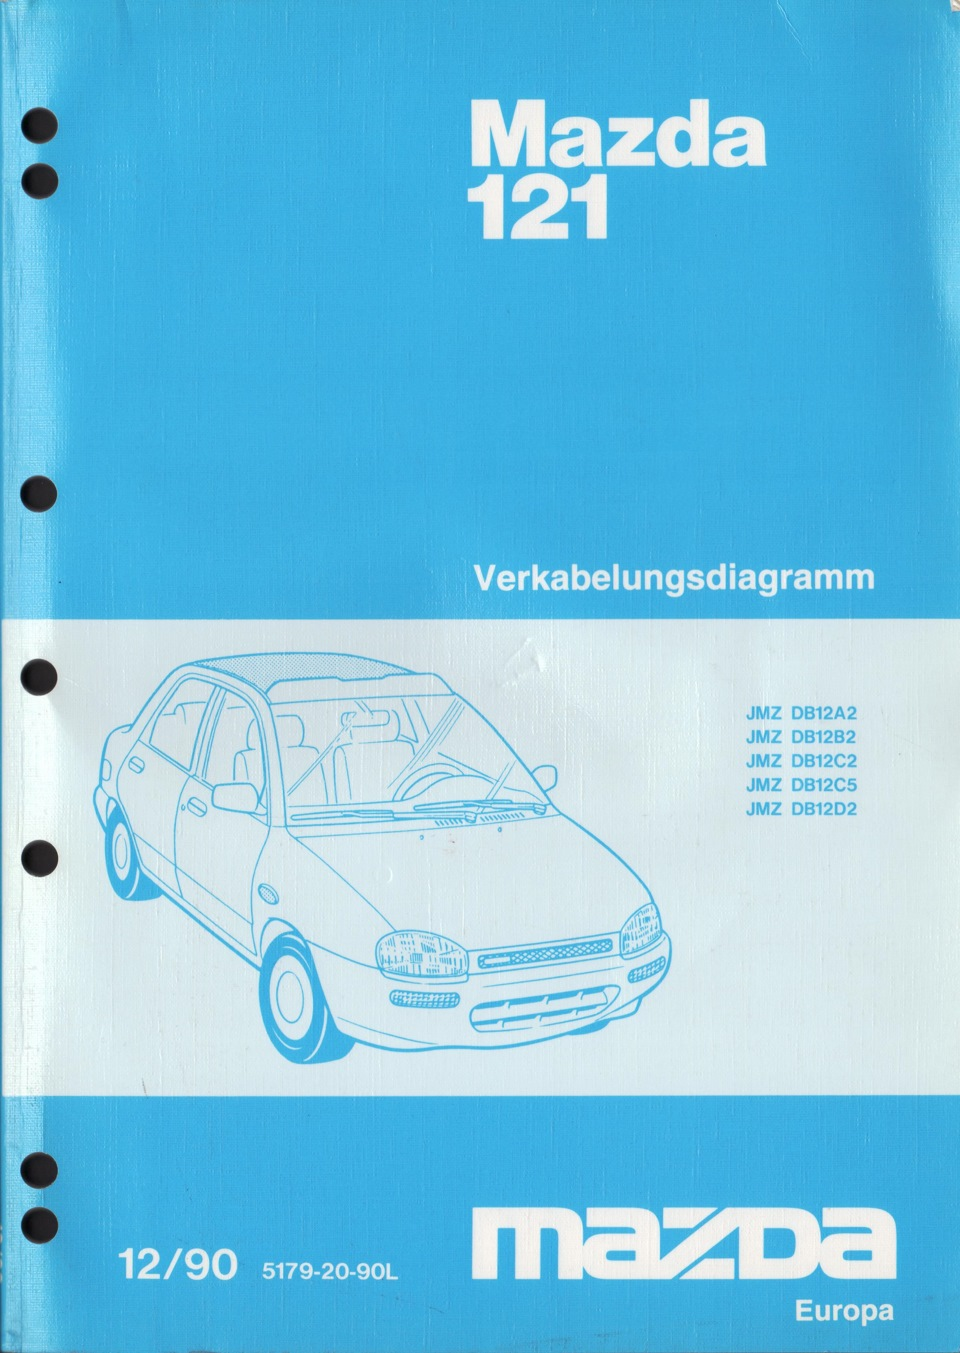 1989 Honda Crx Wiring Diagram Library 91 Mazda B2600 B2600i Little Ranch